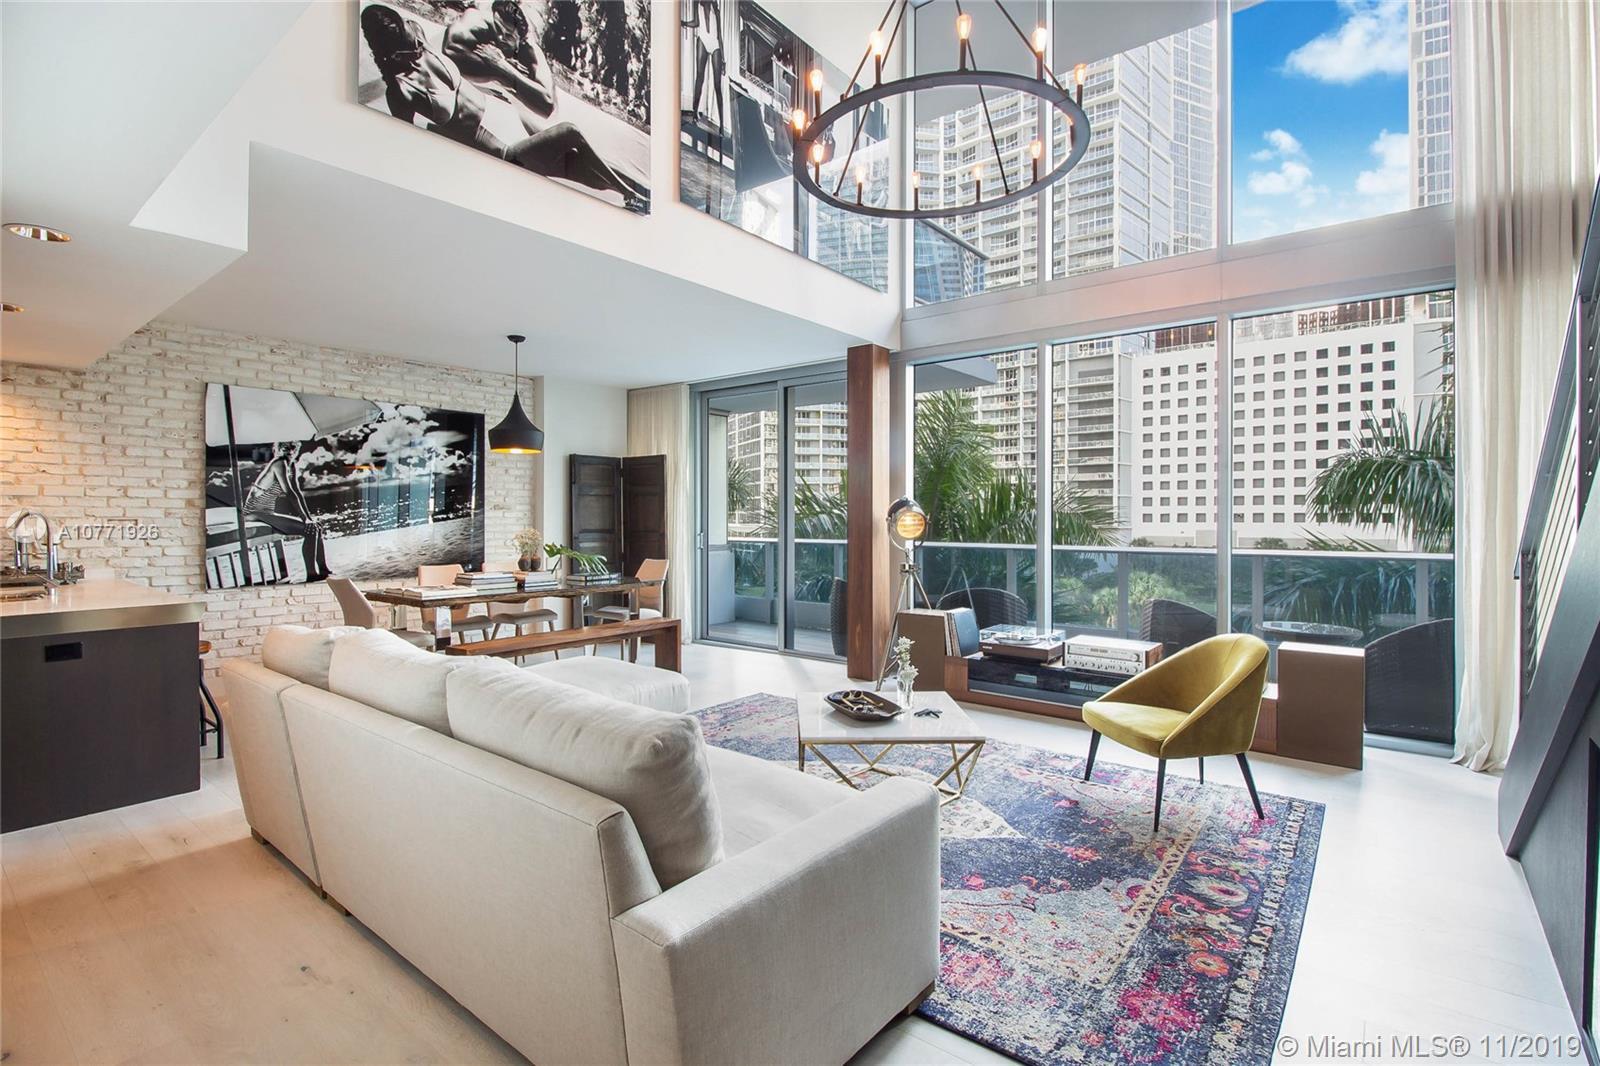 200 Biscayne Boulevard Way #306, Miami, FL 33131 - Miami, FL real estate listing